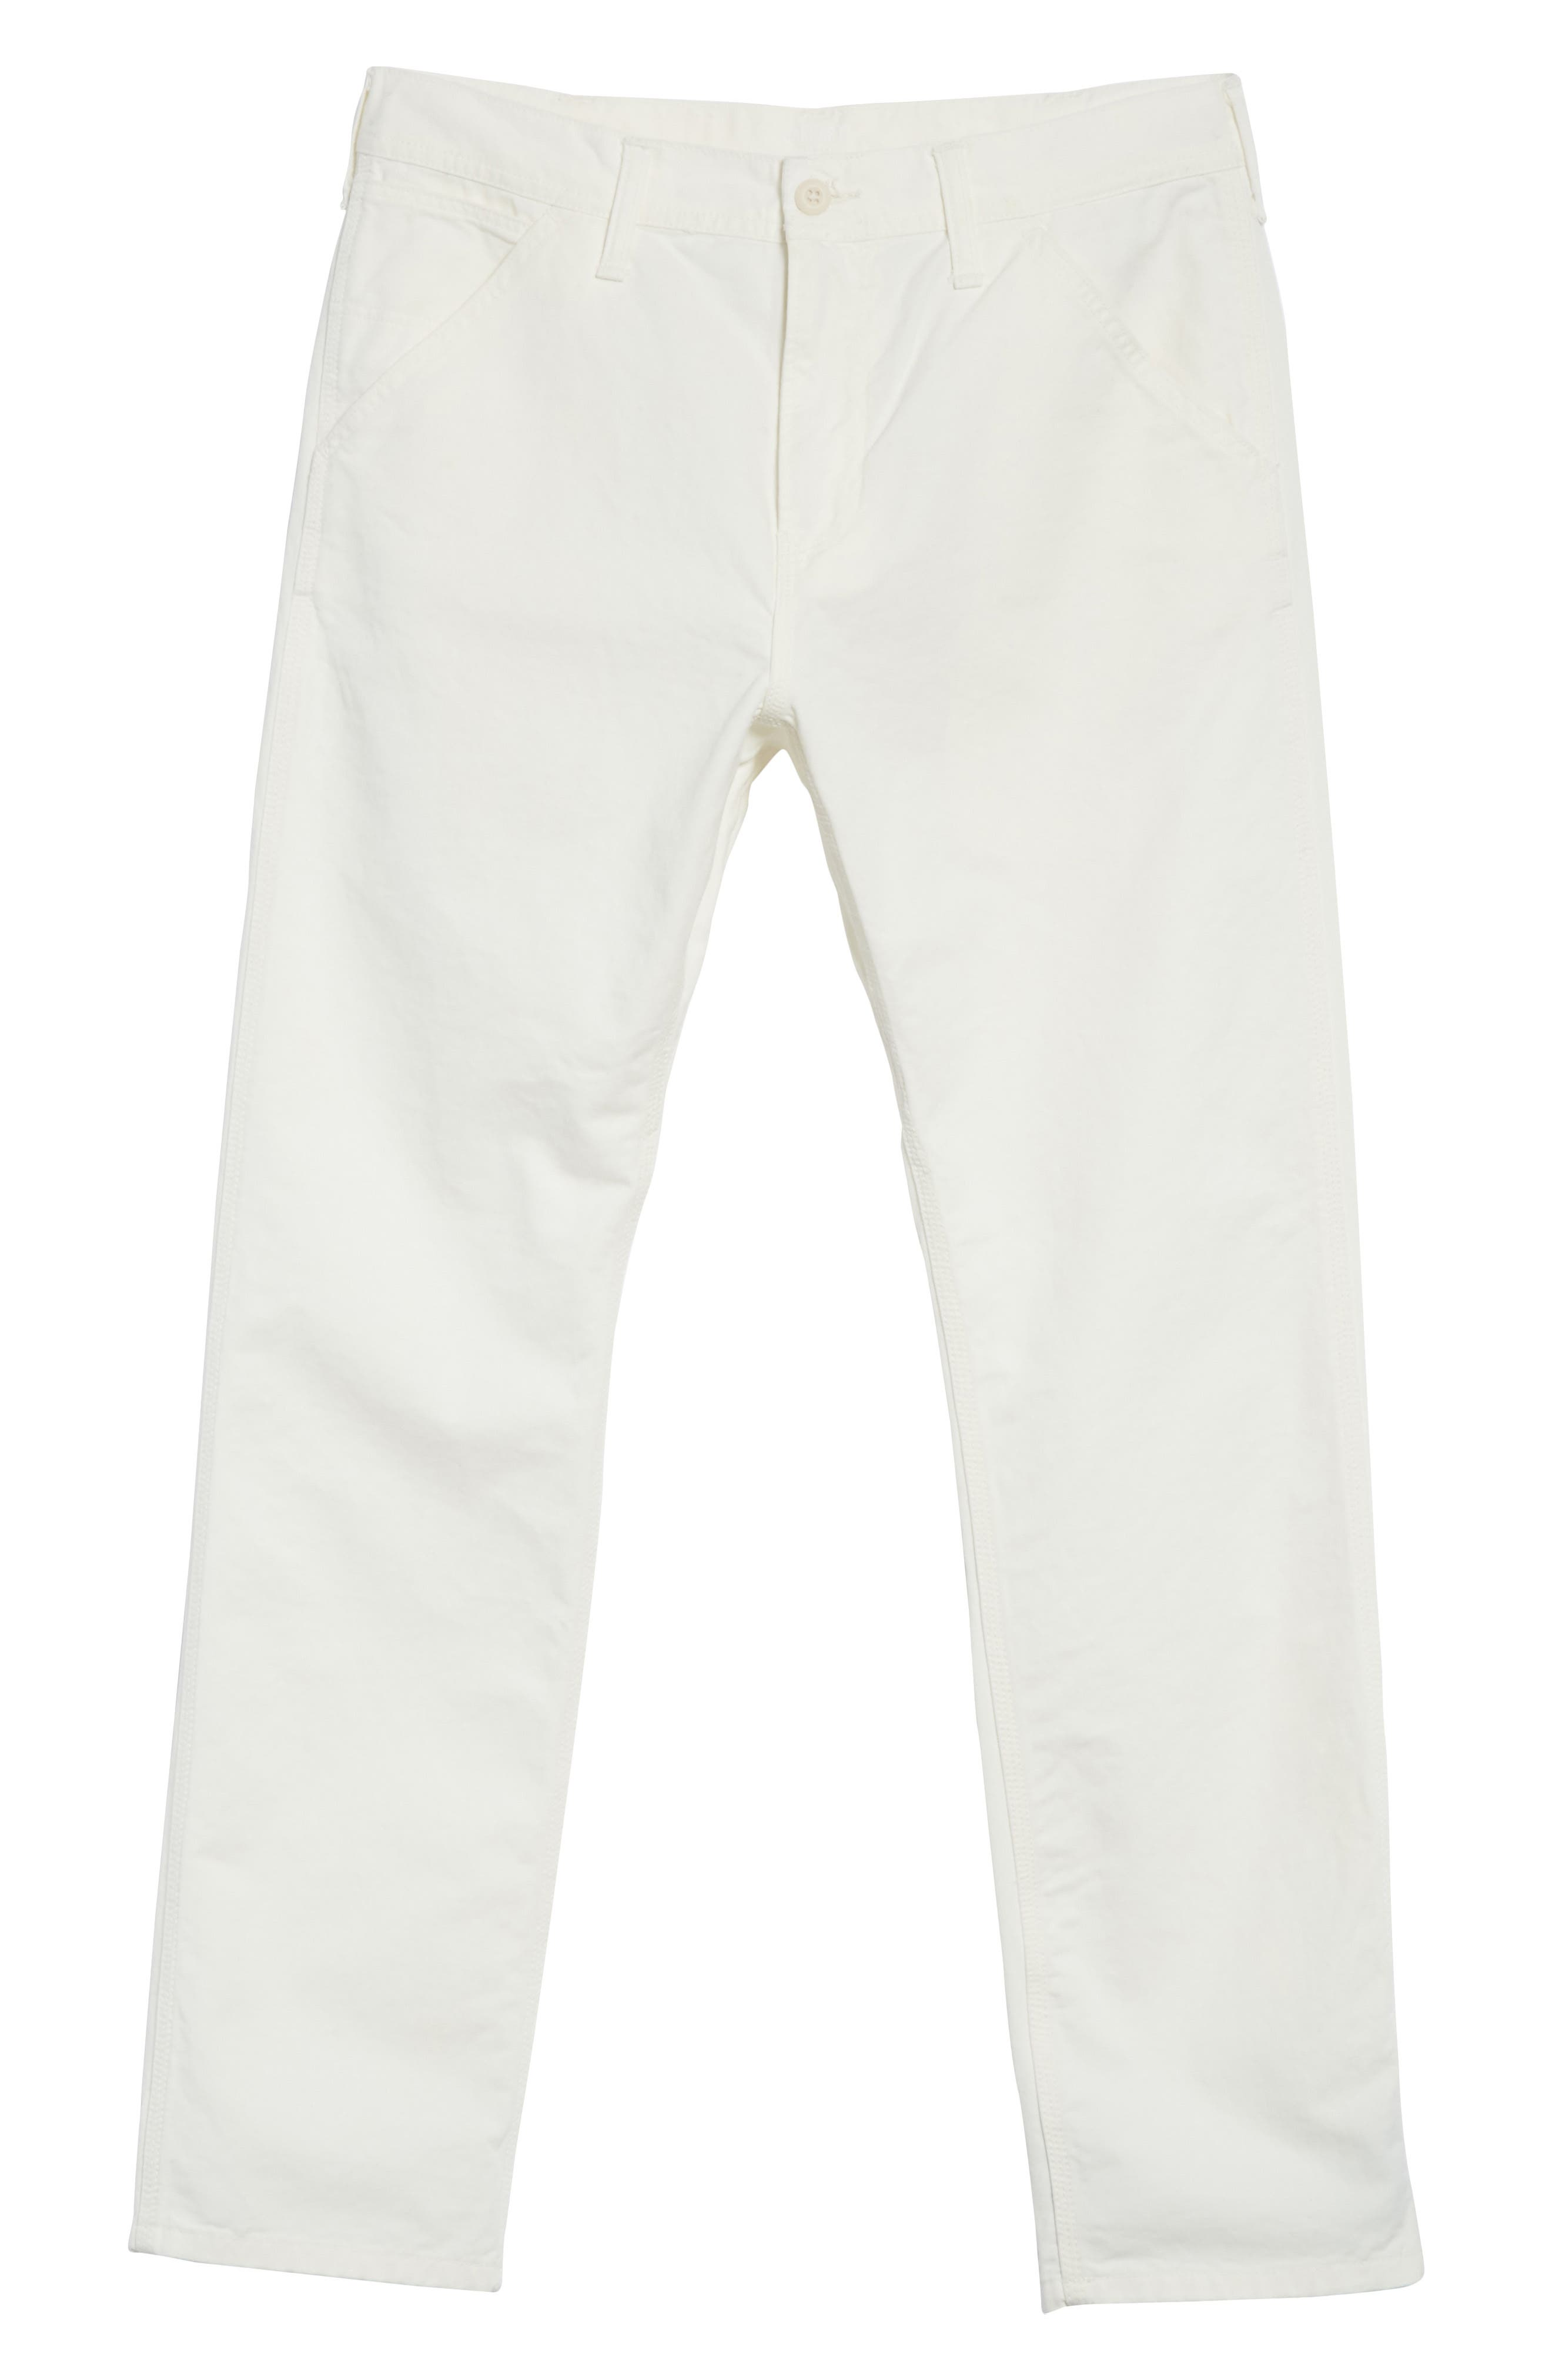 Chalk Pants,                             Alternate thumbnail 6, color,                             Off White